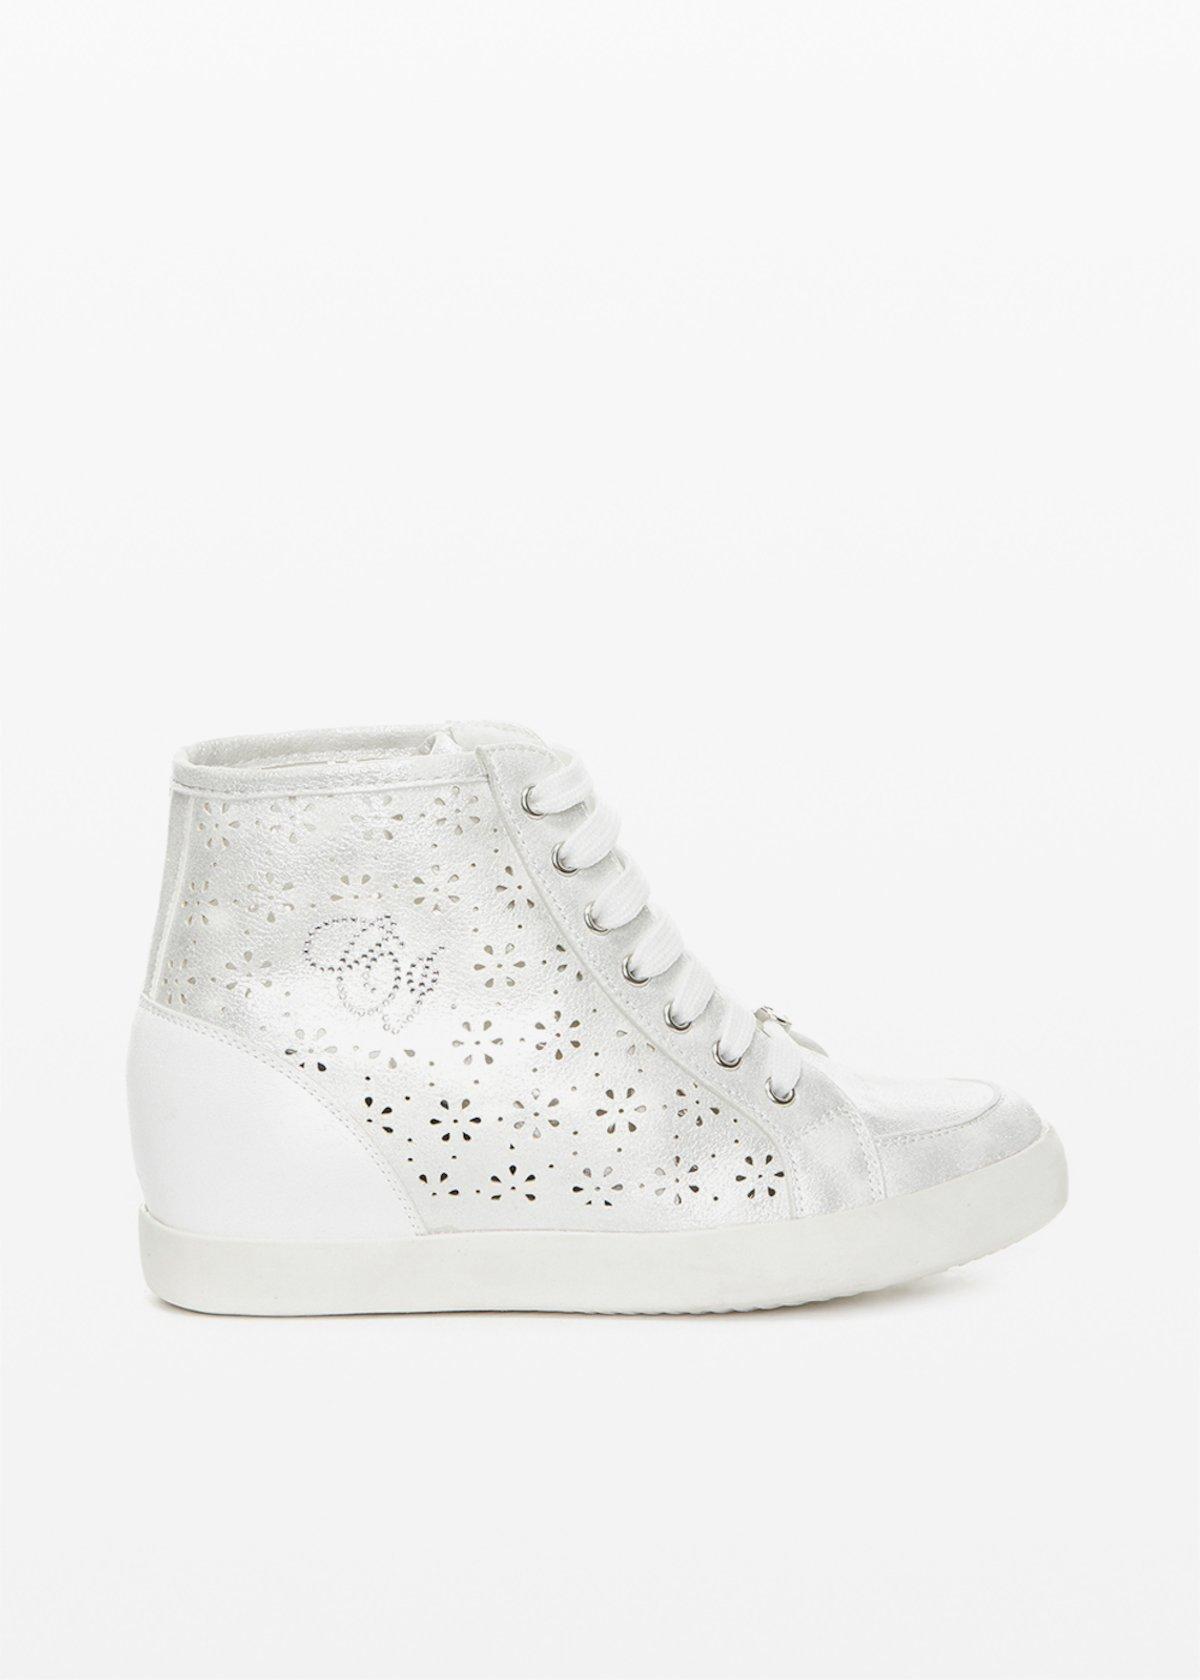 Sneakers Shery in ecopelle traforate - Silver - Donna - Immagine categoria